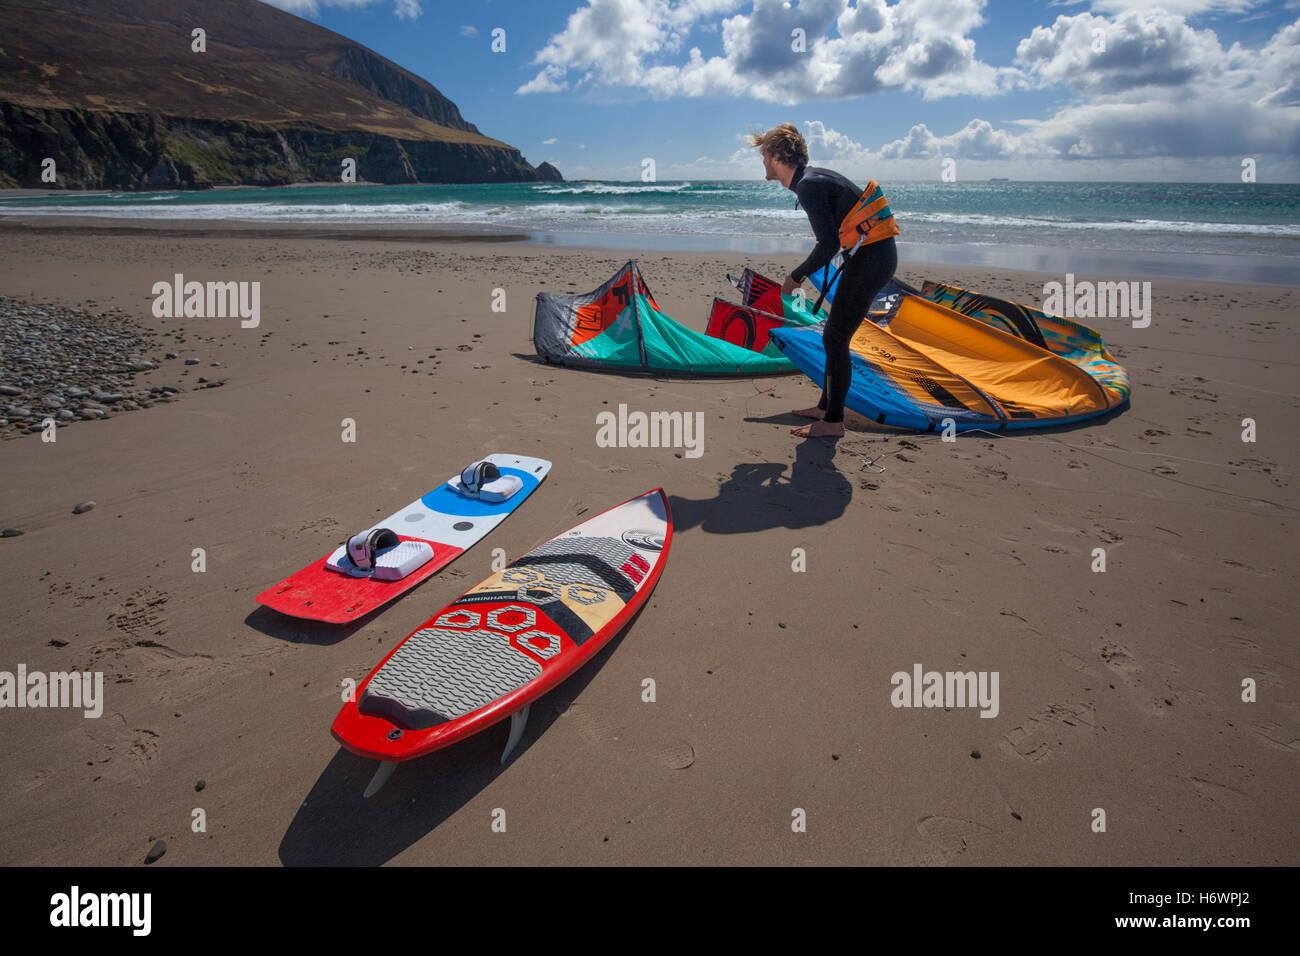 Francois Colussi preparing to kitesurf from Keel Strand, Achill Island, County Mayo, Ireland. - Stock Image